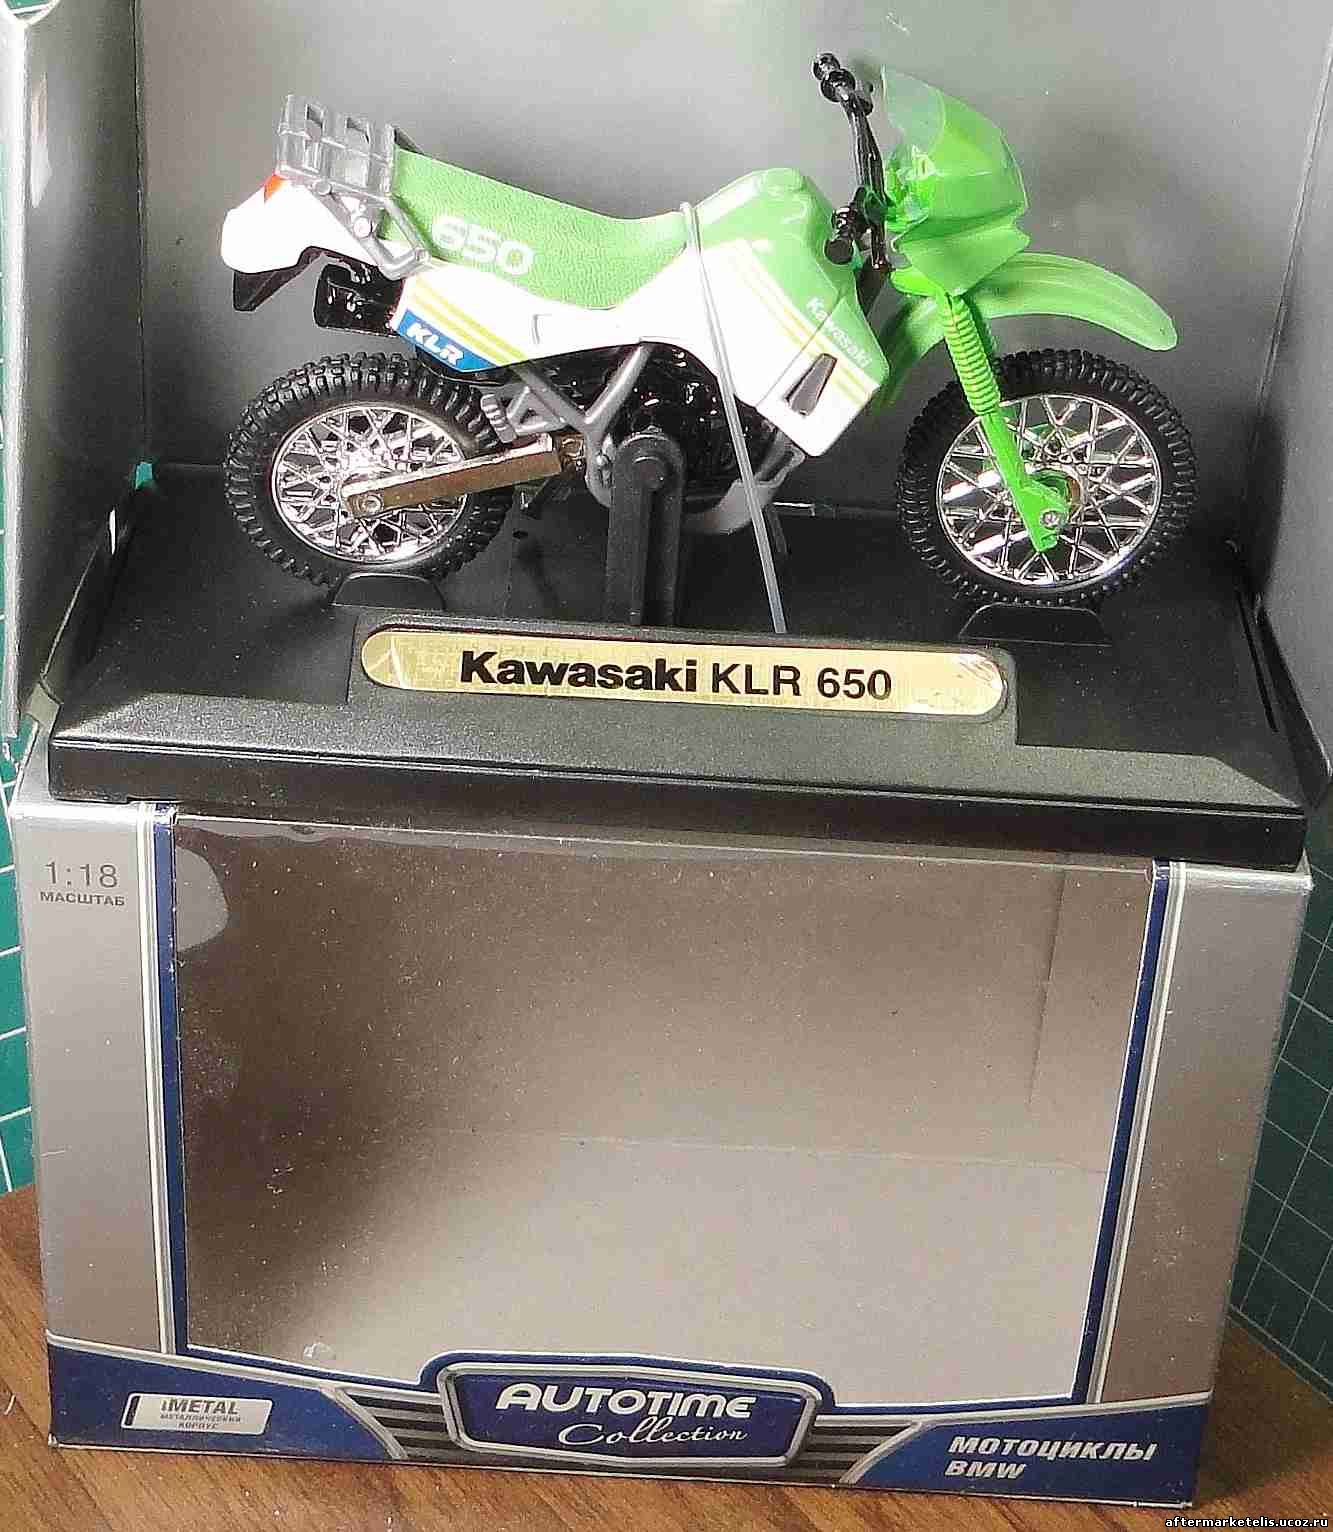 Kawasaki KLR 650 MotorMax